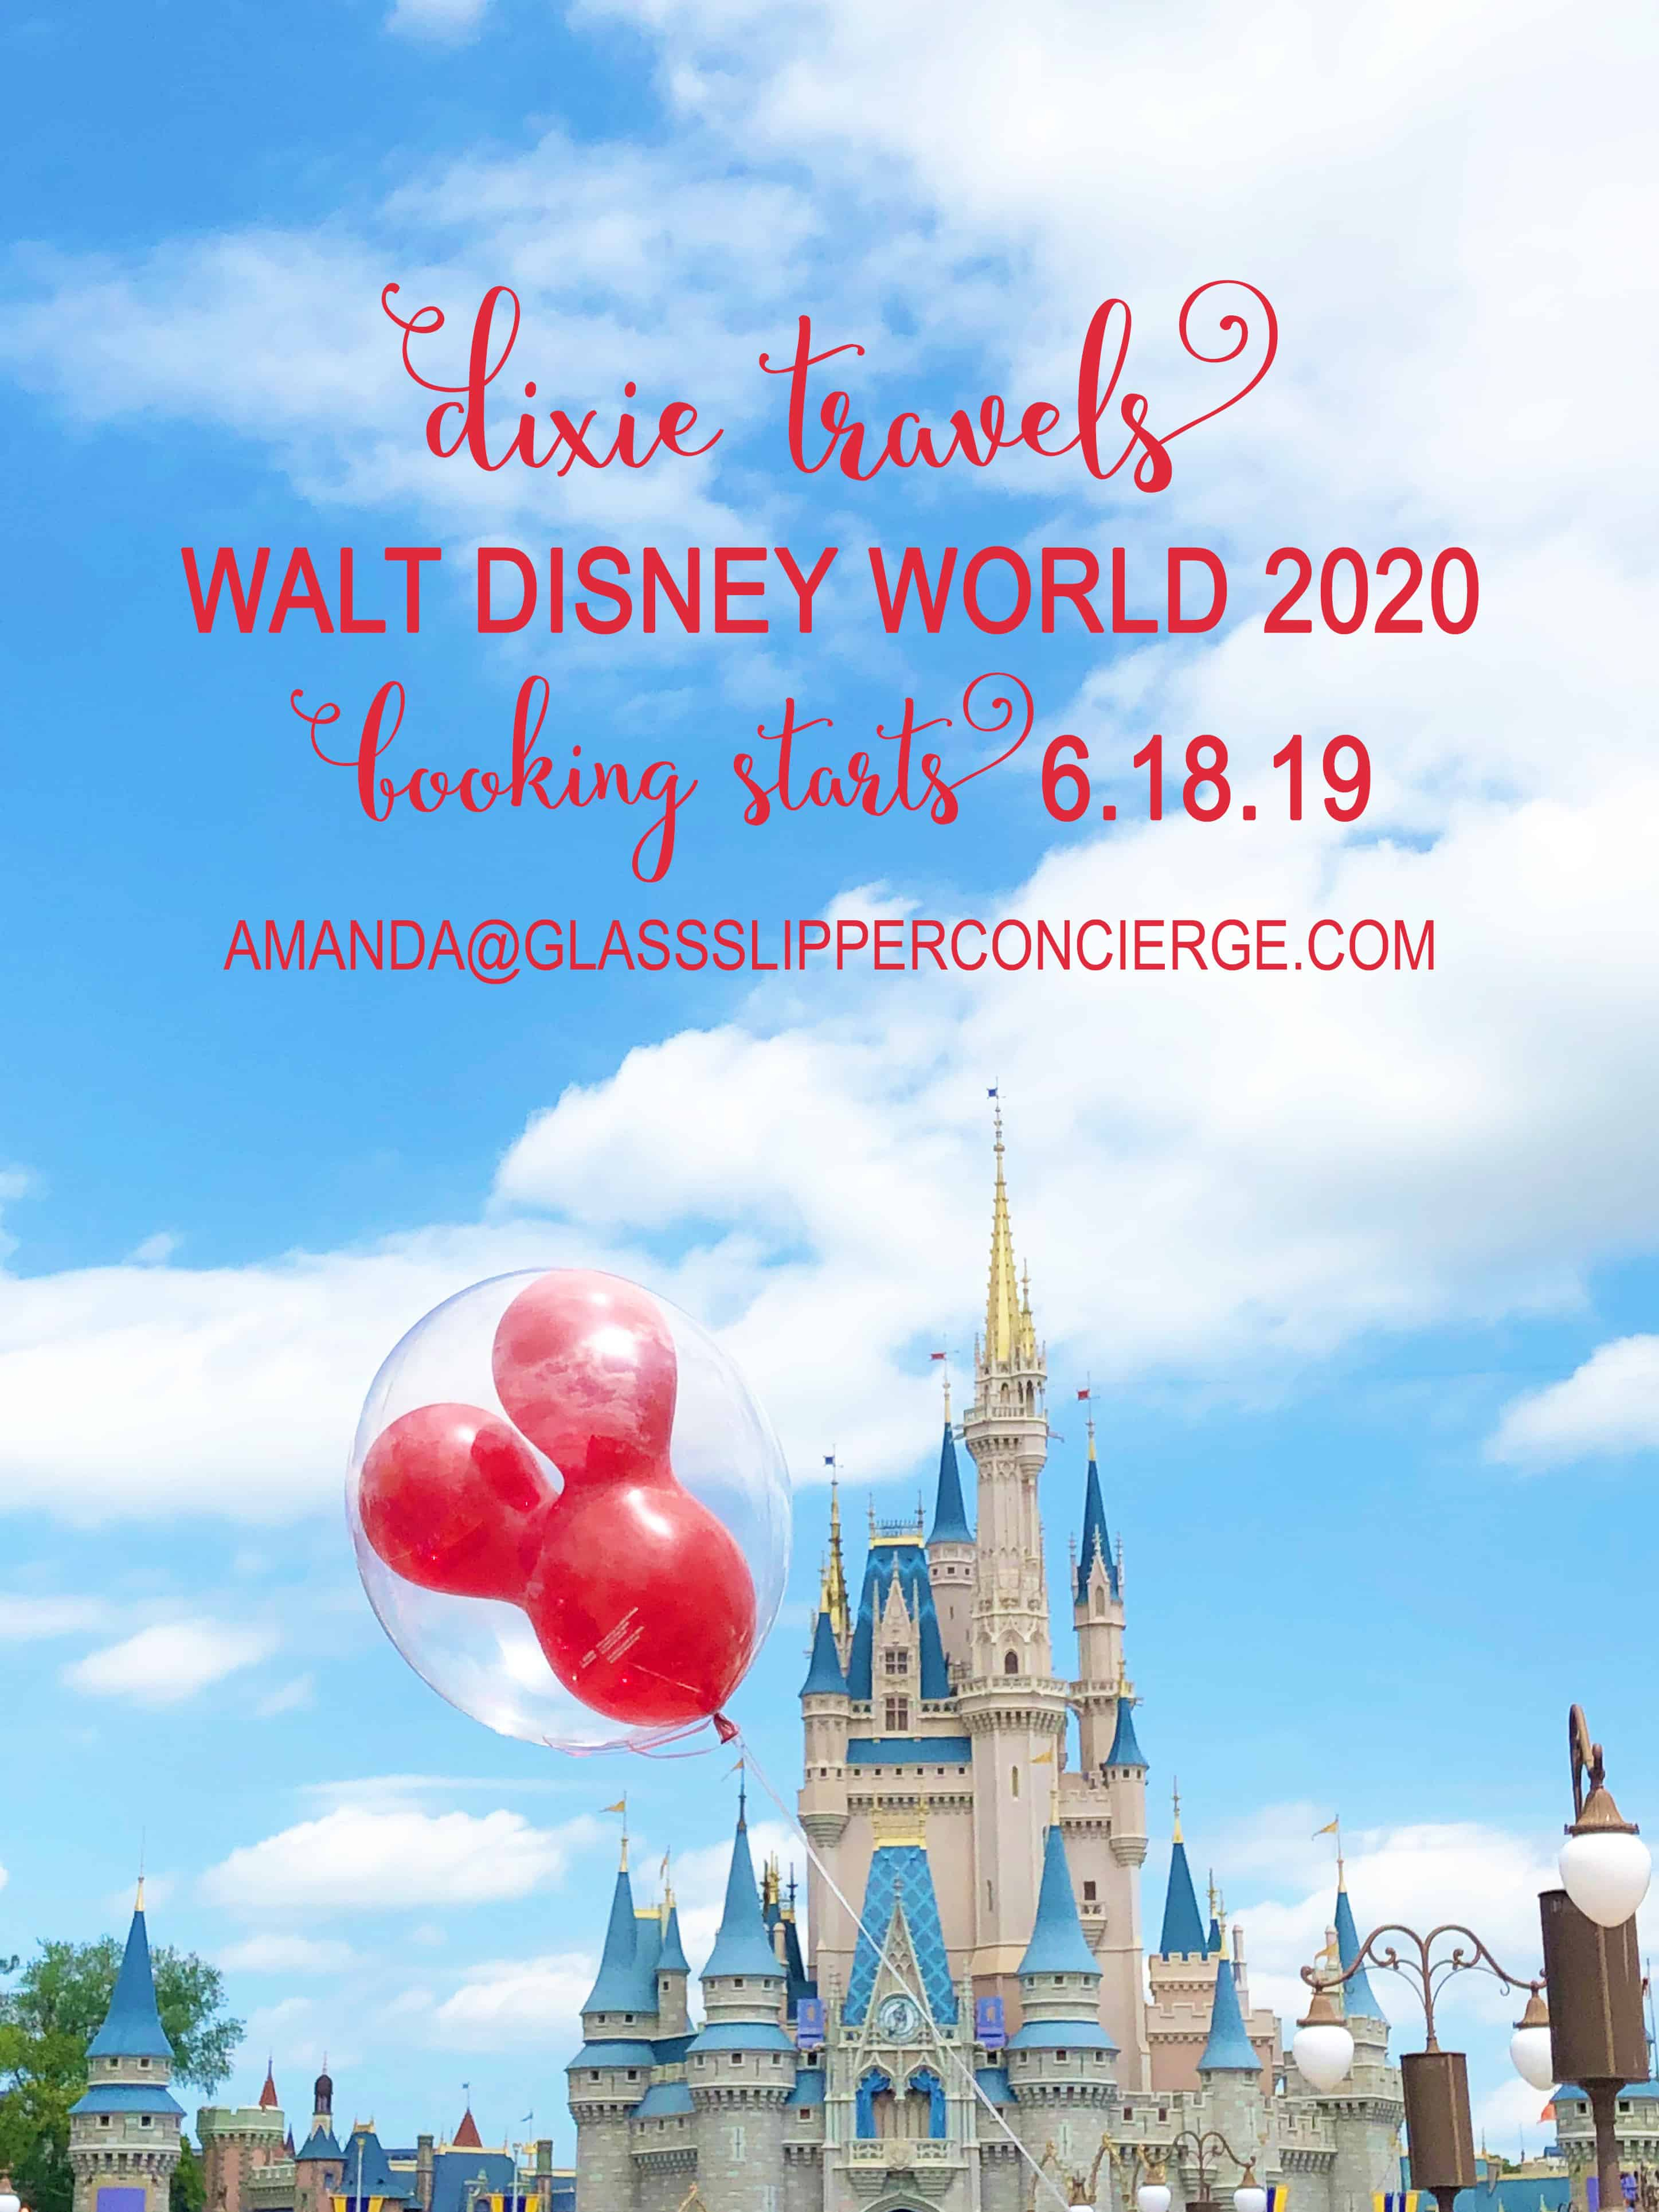 Walt Disney World 2020: Booking Opens June 18 – Dixie Delights